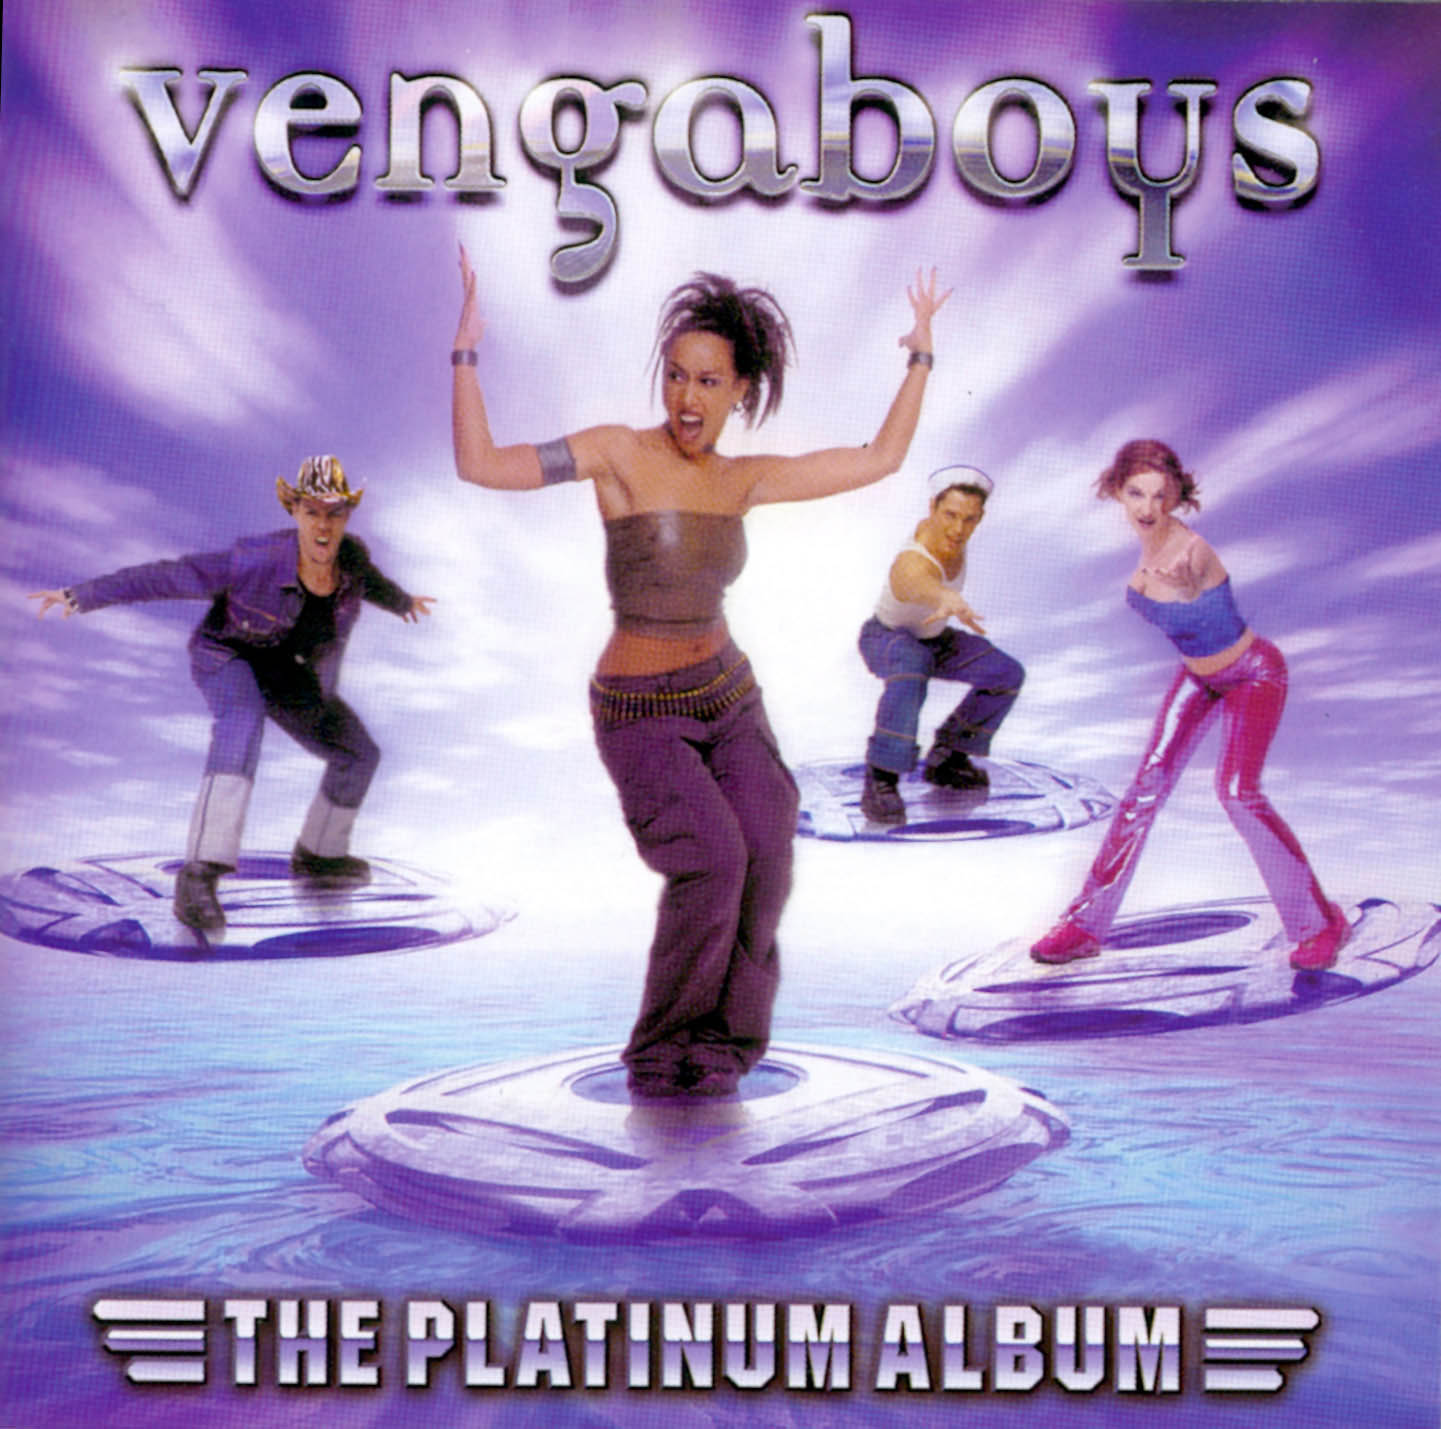 Vengaboys-The_Platinum_Album-Frontal.jpg